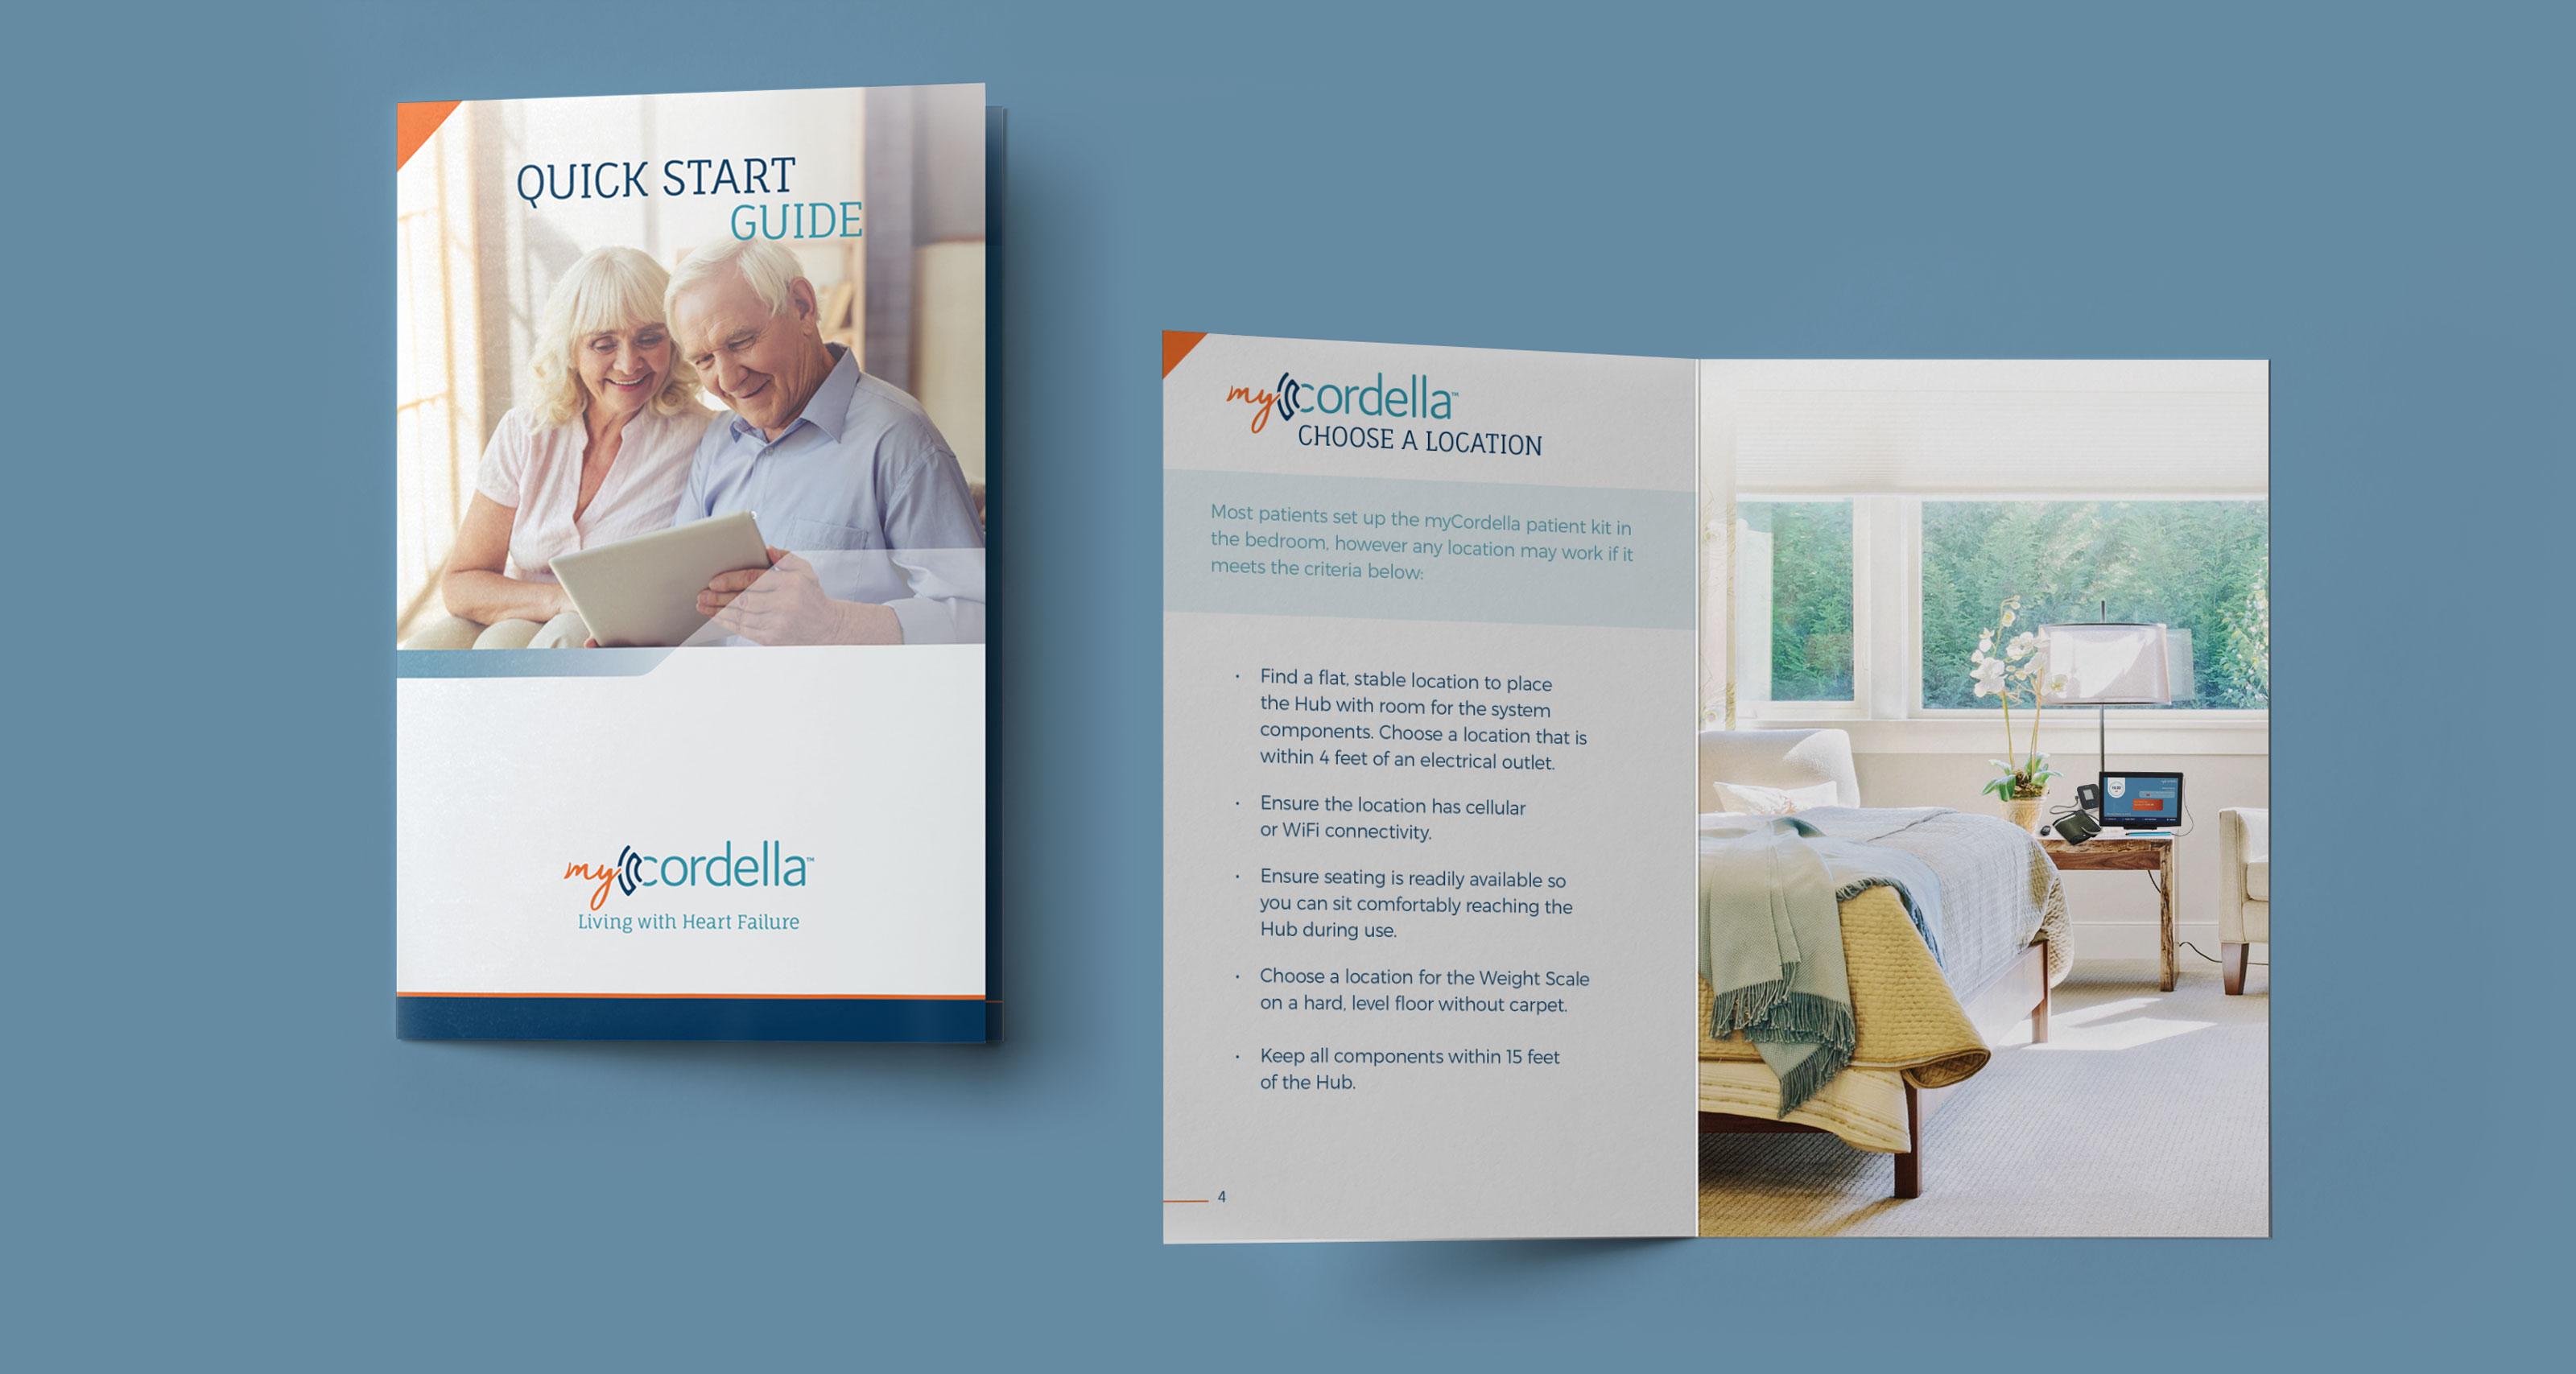 Endotronix MyCordella Patient Quick Start Guide